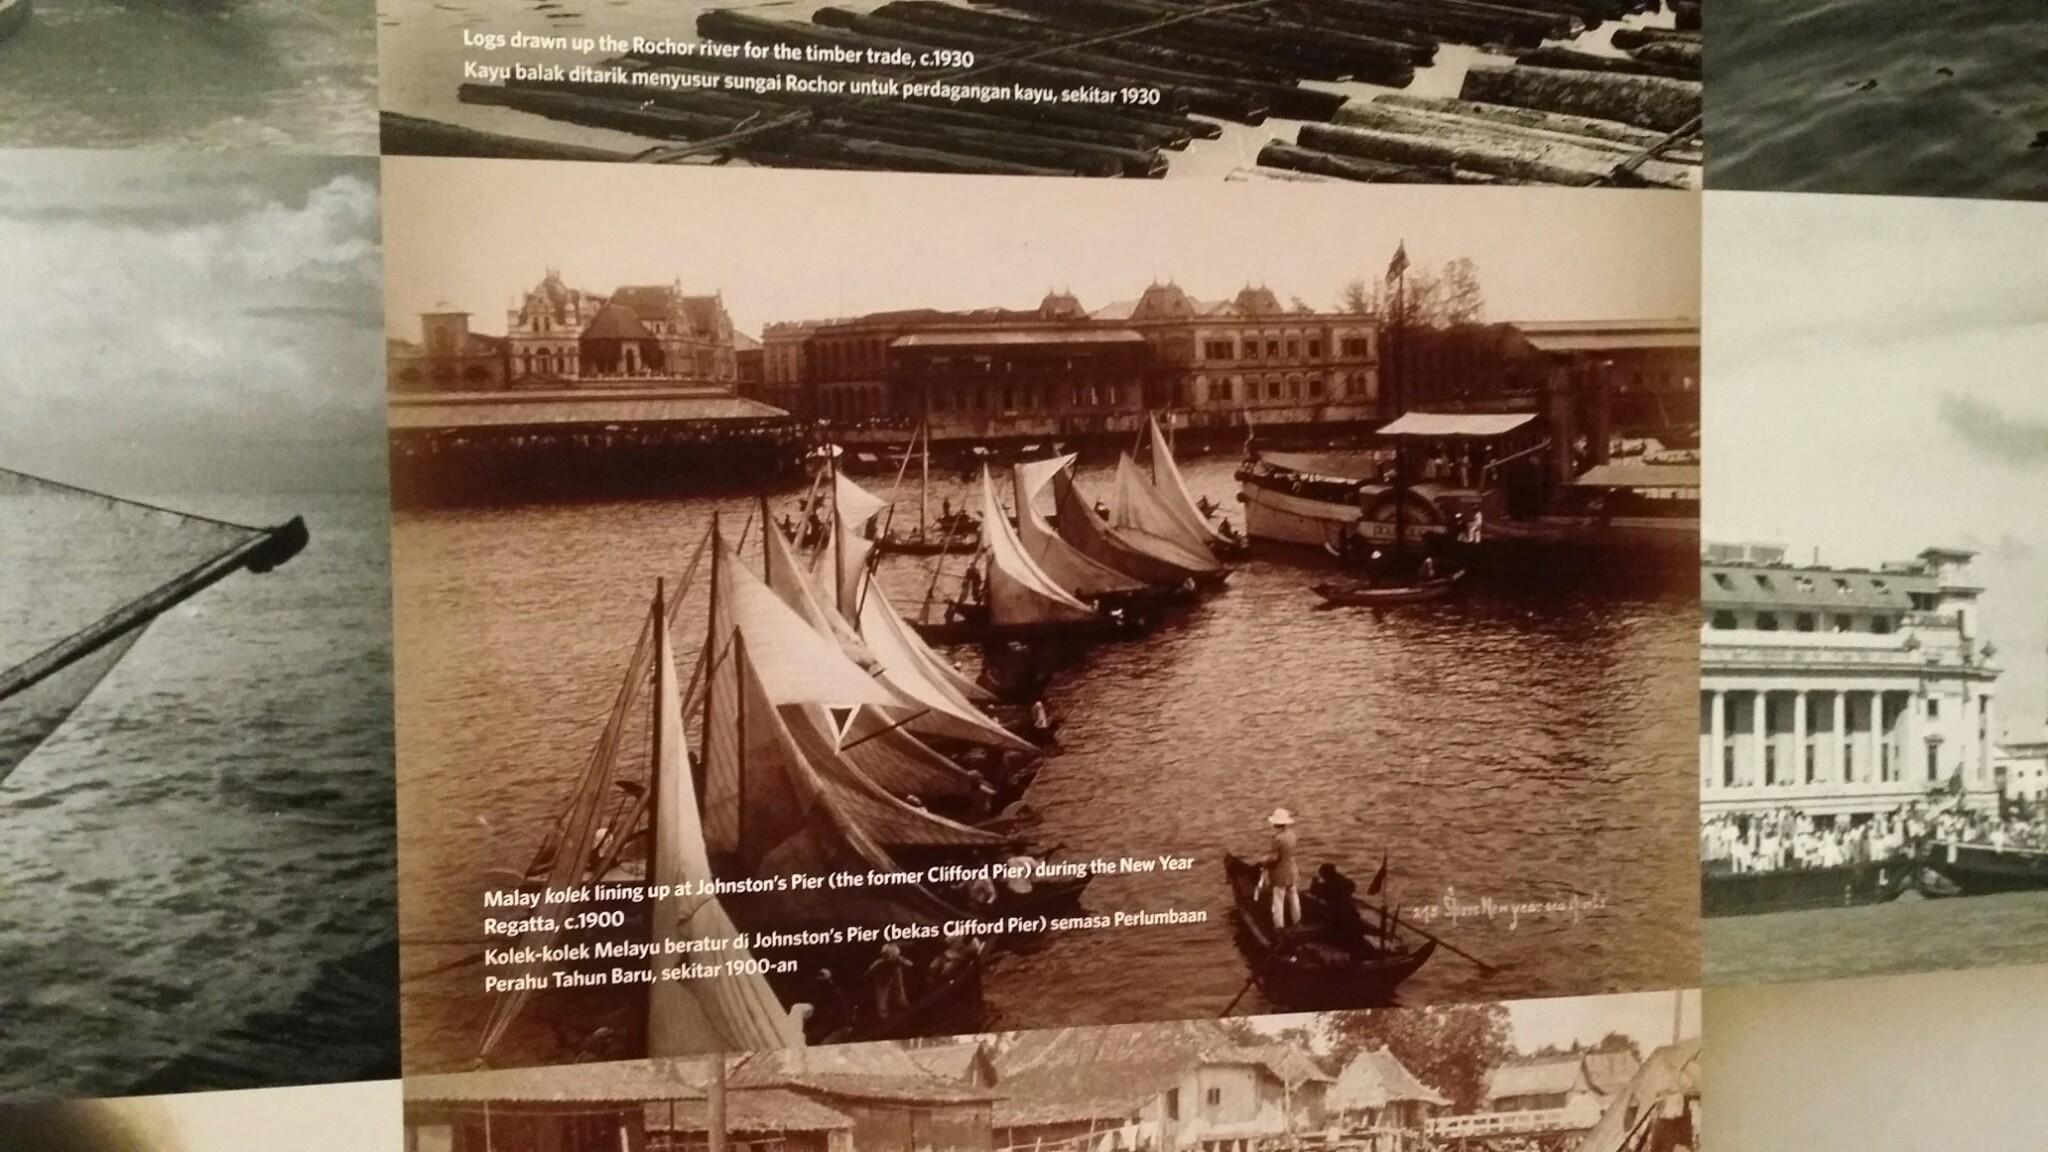 Singapore-Malay-Heritage-Center-Kolek-boats.jpg